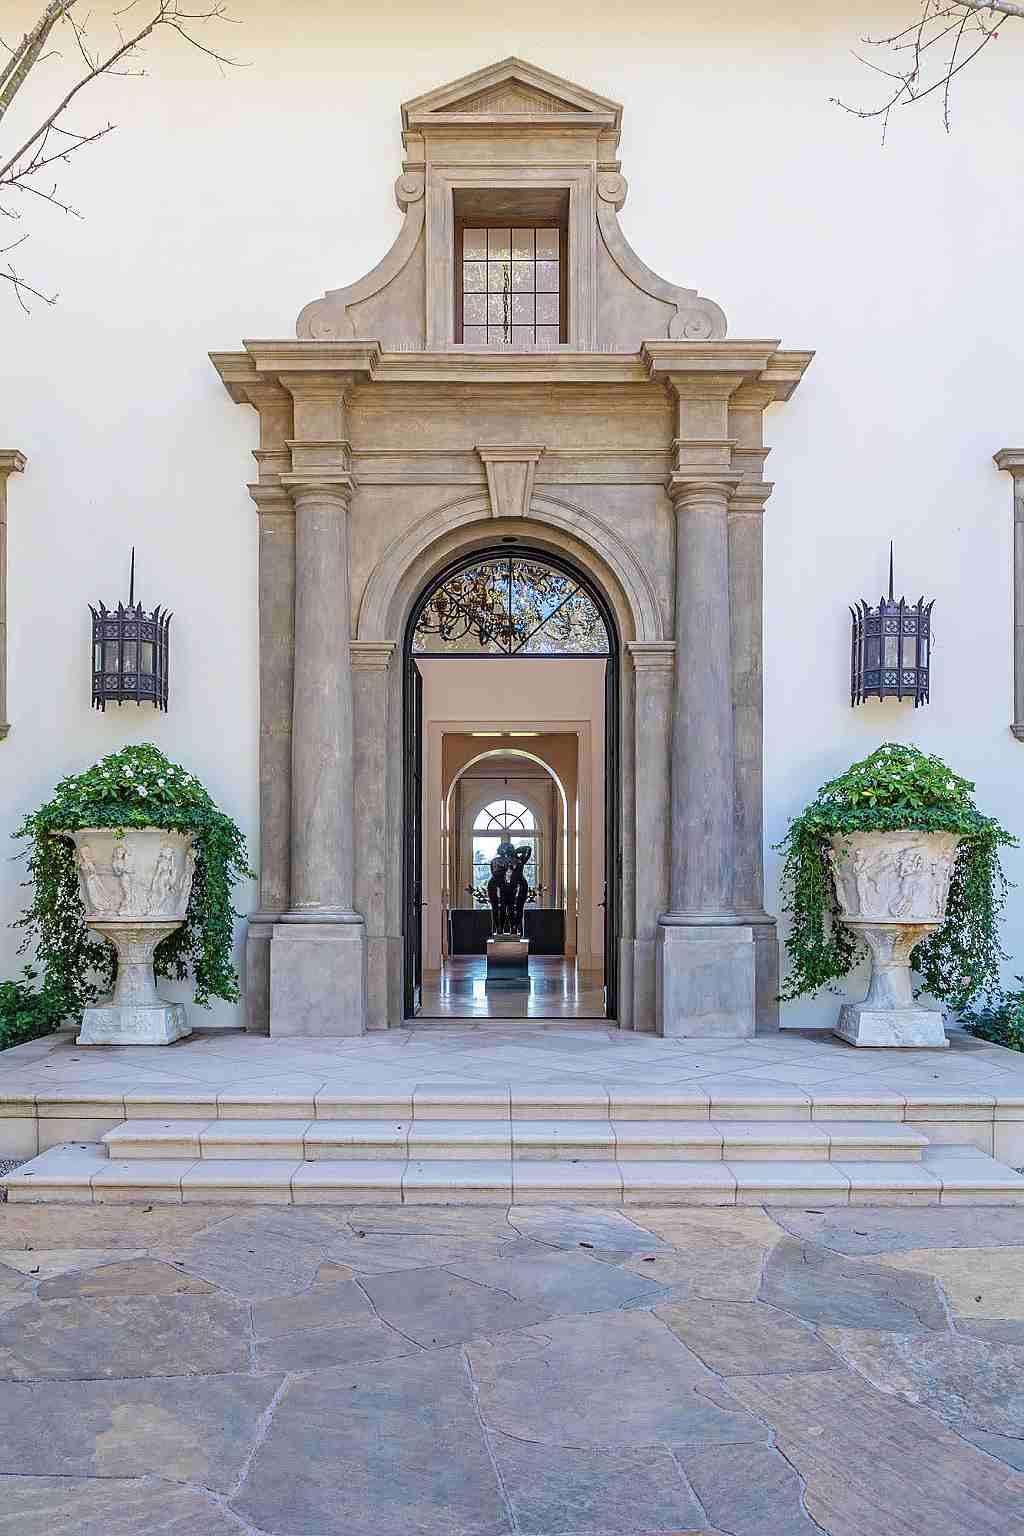 Hilton&Hyland - sídlo Sylvestera Stalloneho v Los Angeles je na prodej 02